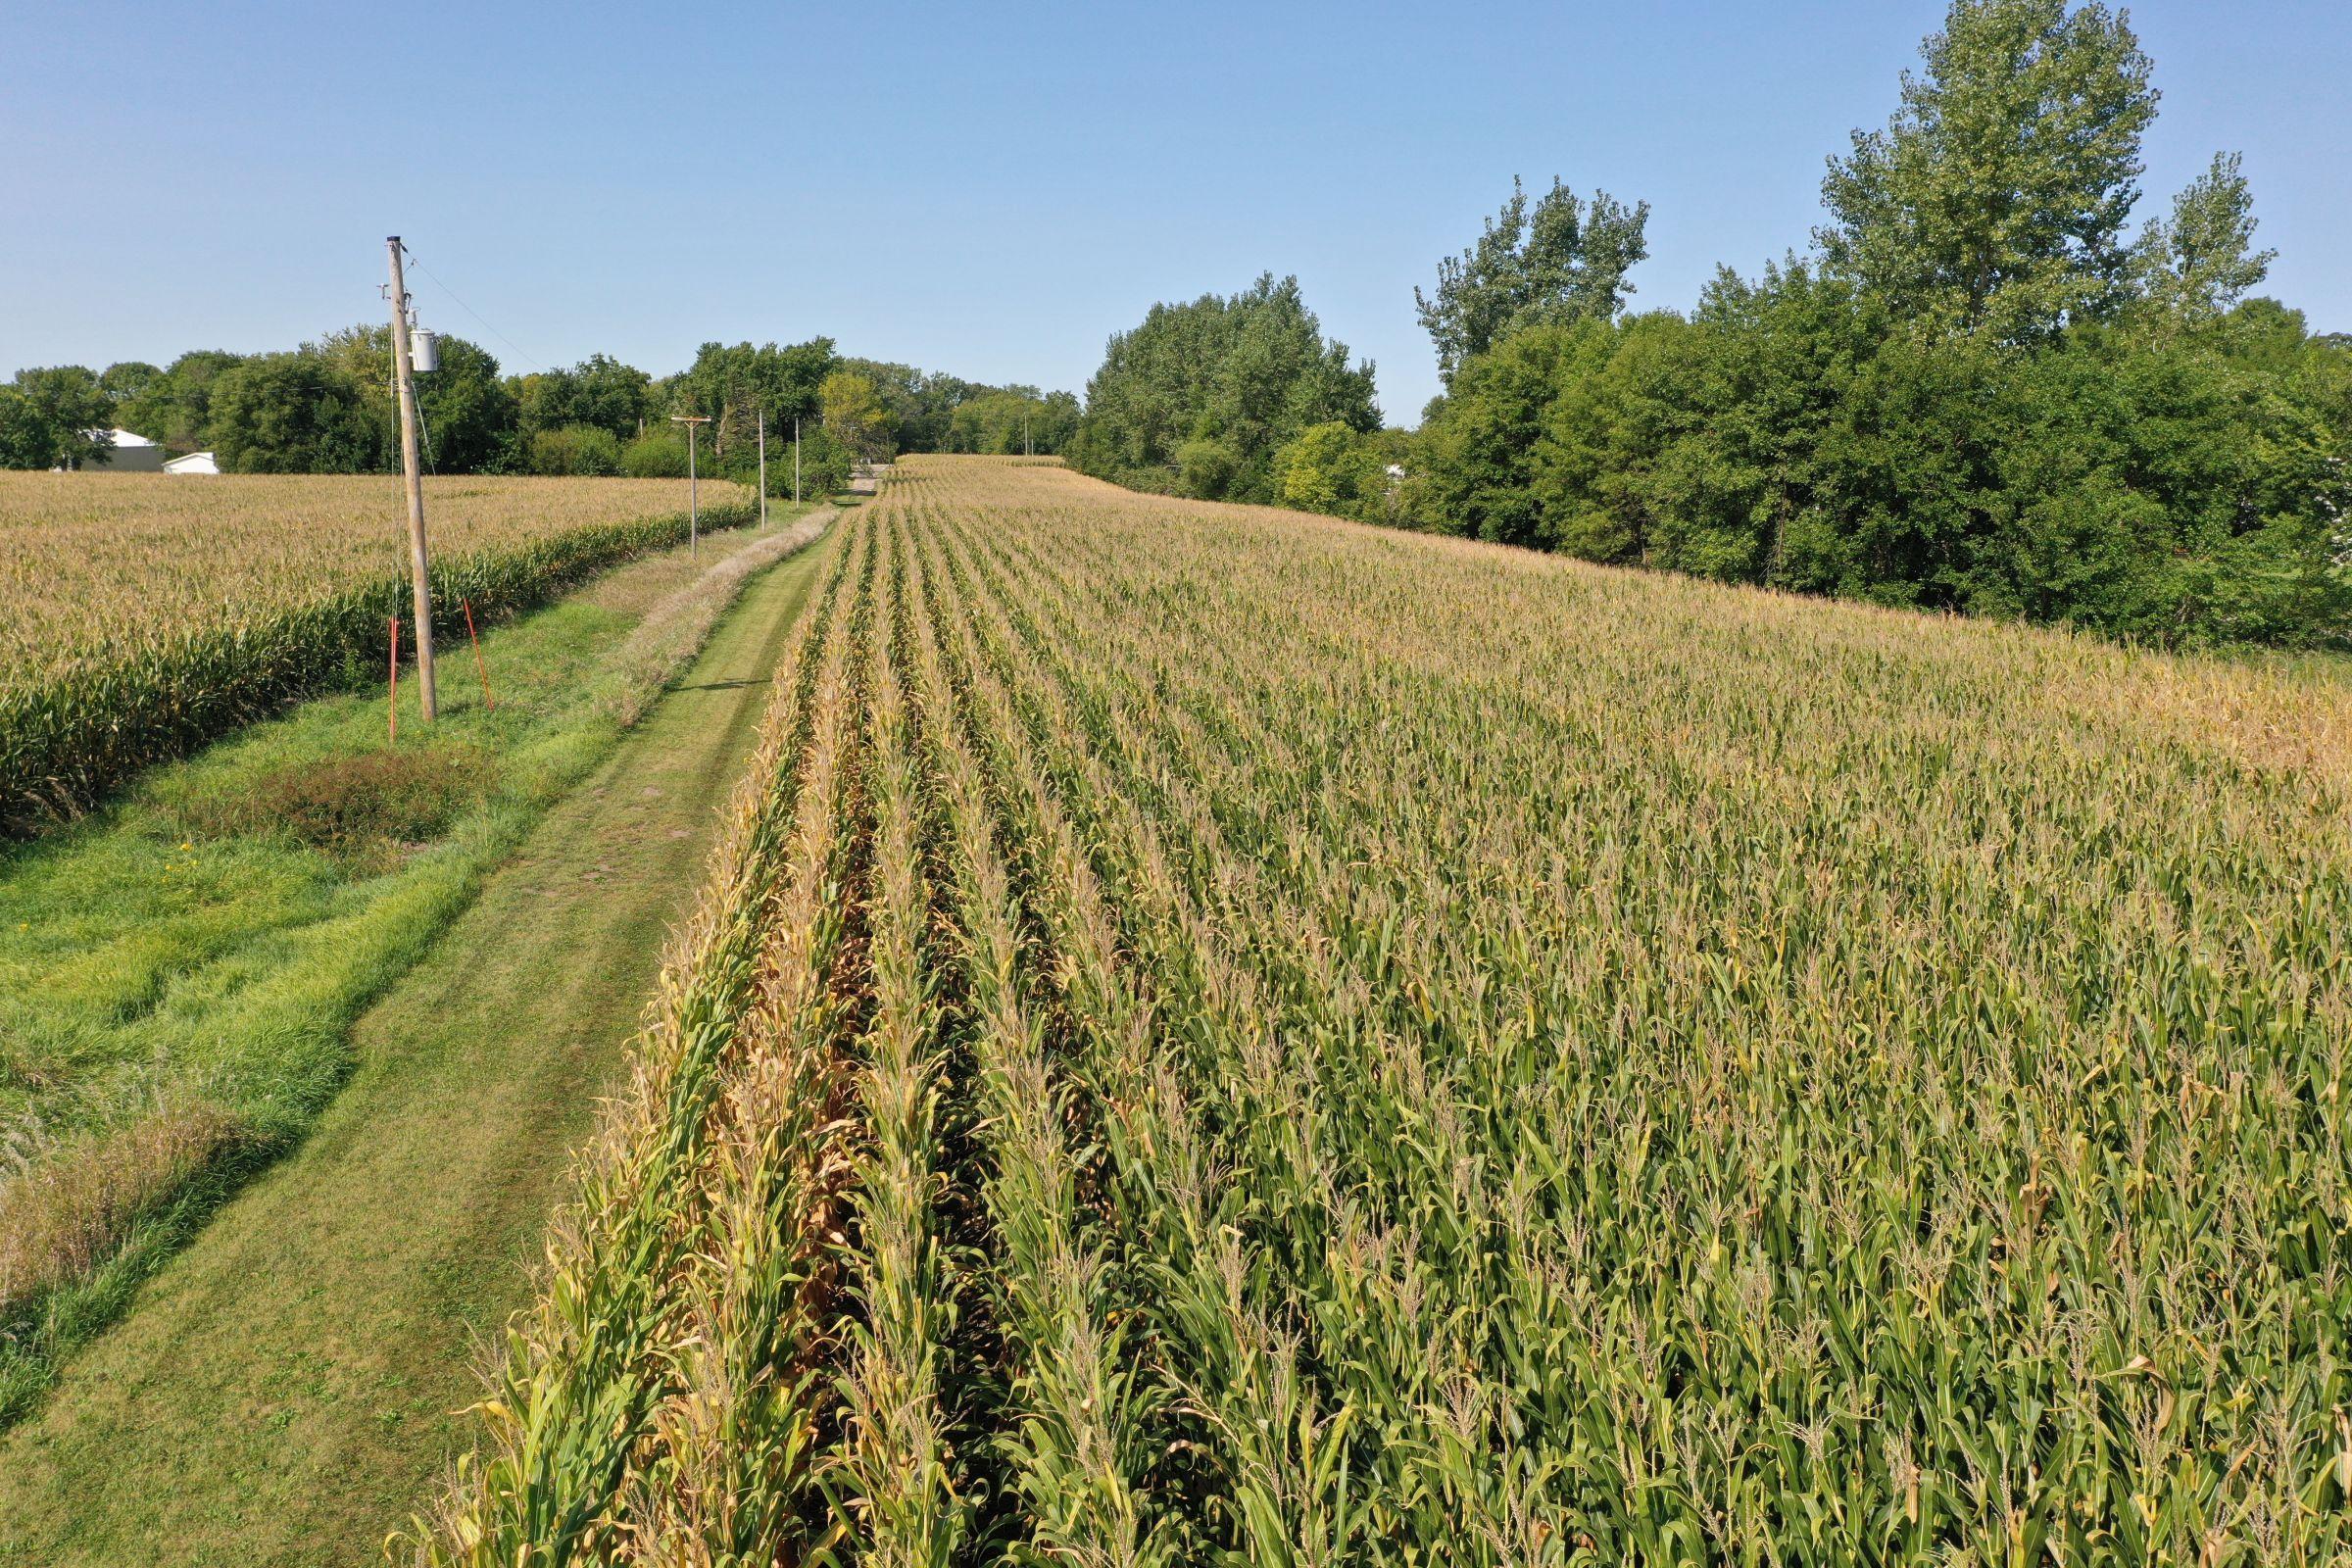 Guthrie County Iowa Farmland for Sale